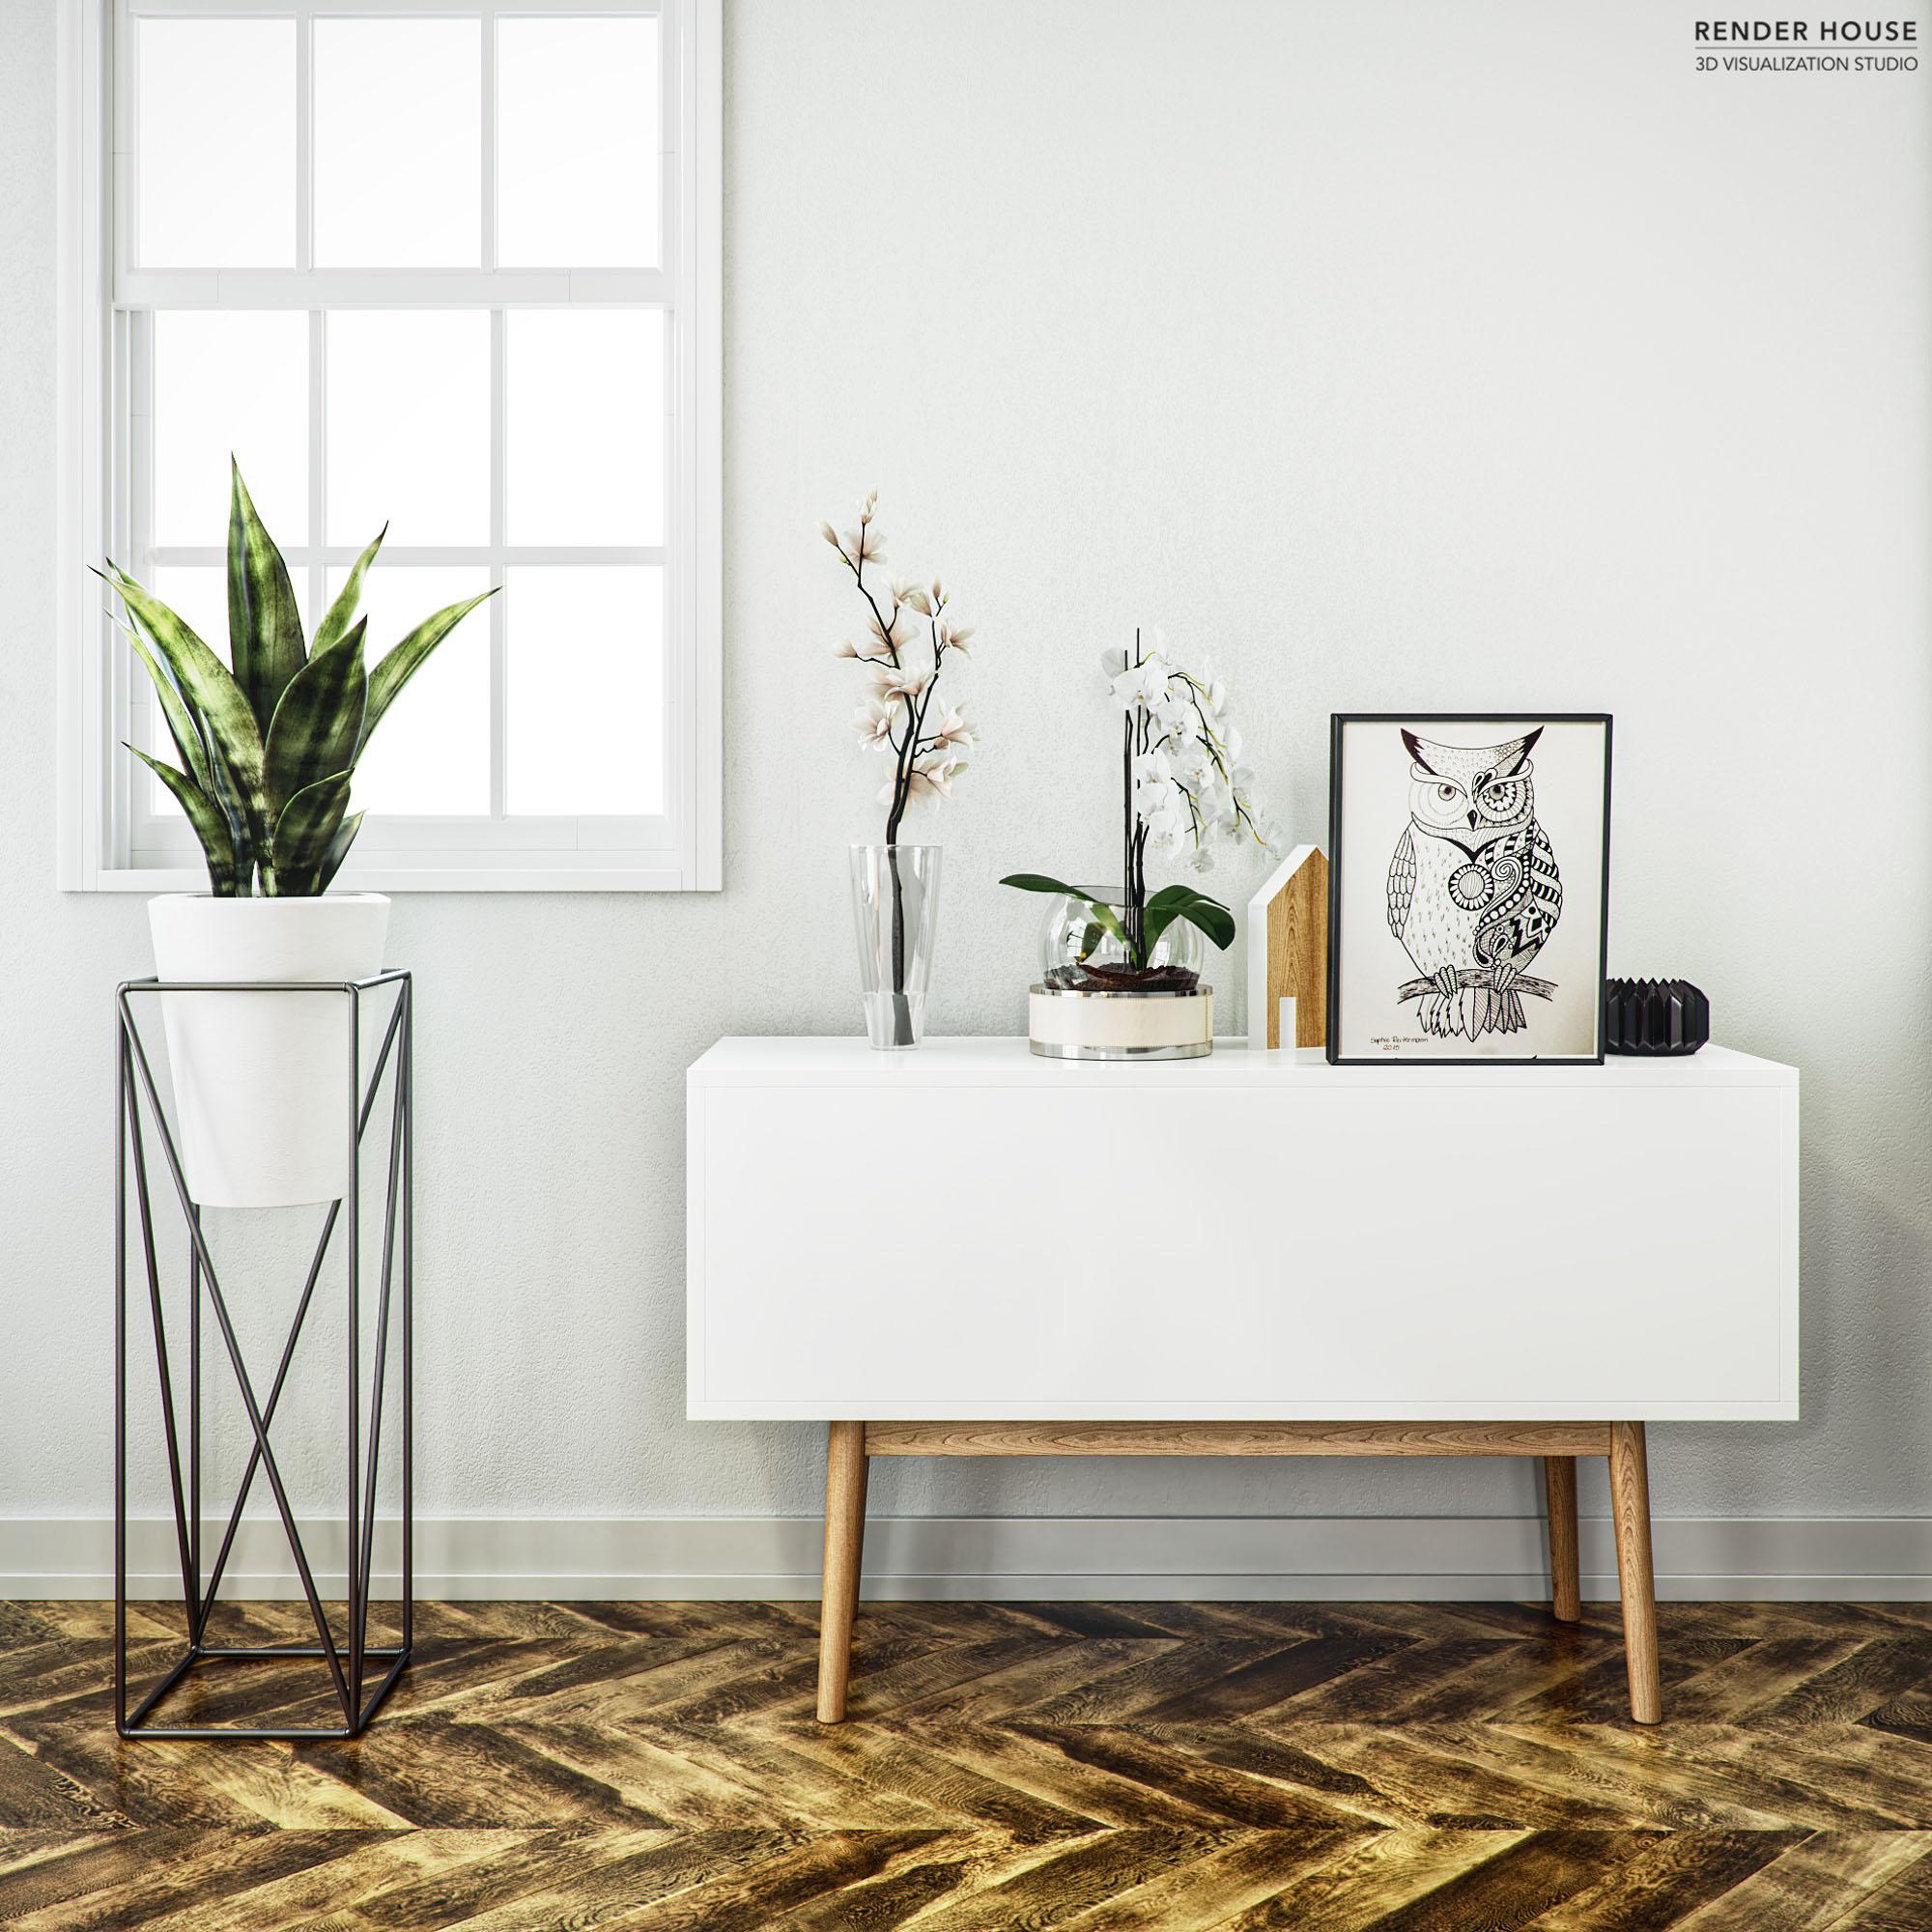 Interior Hyper realistic render